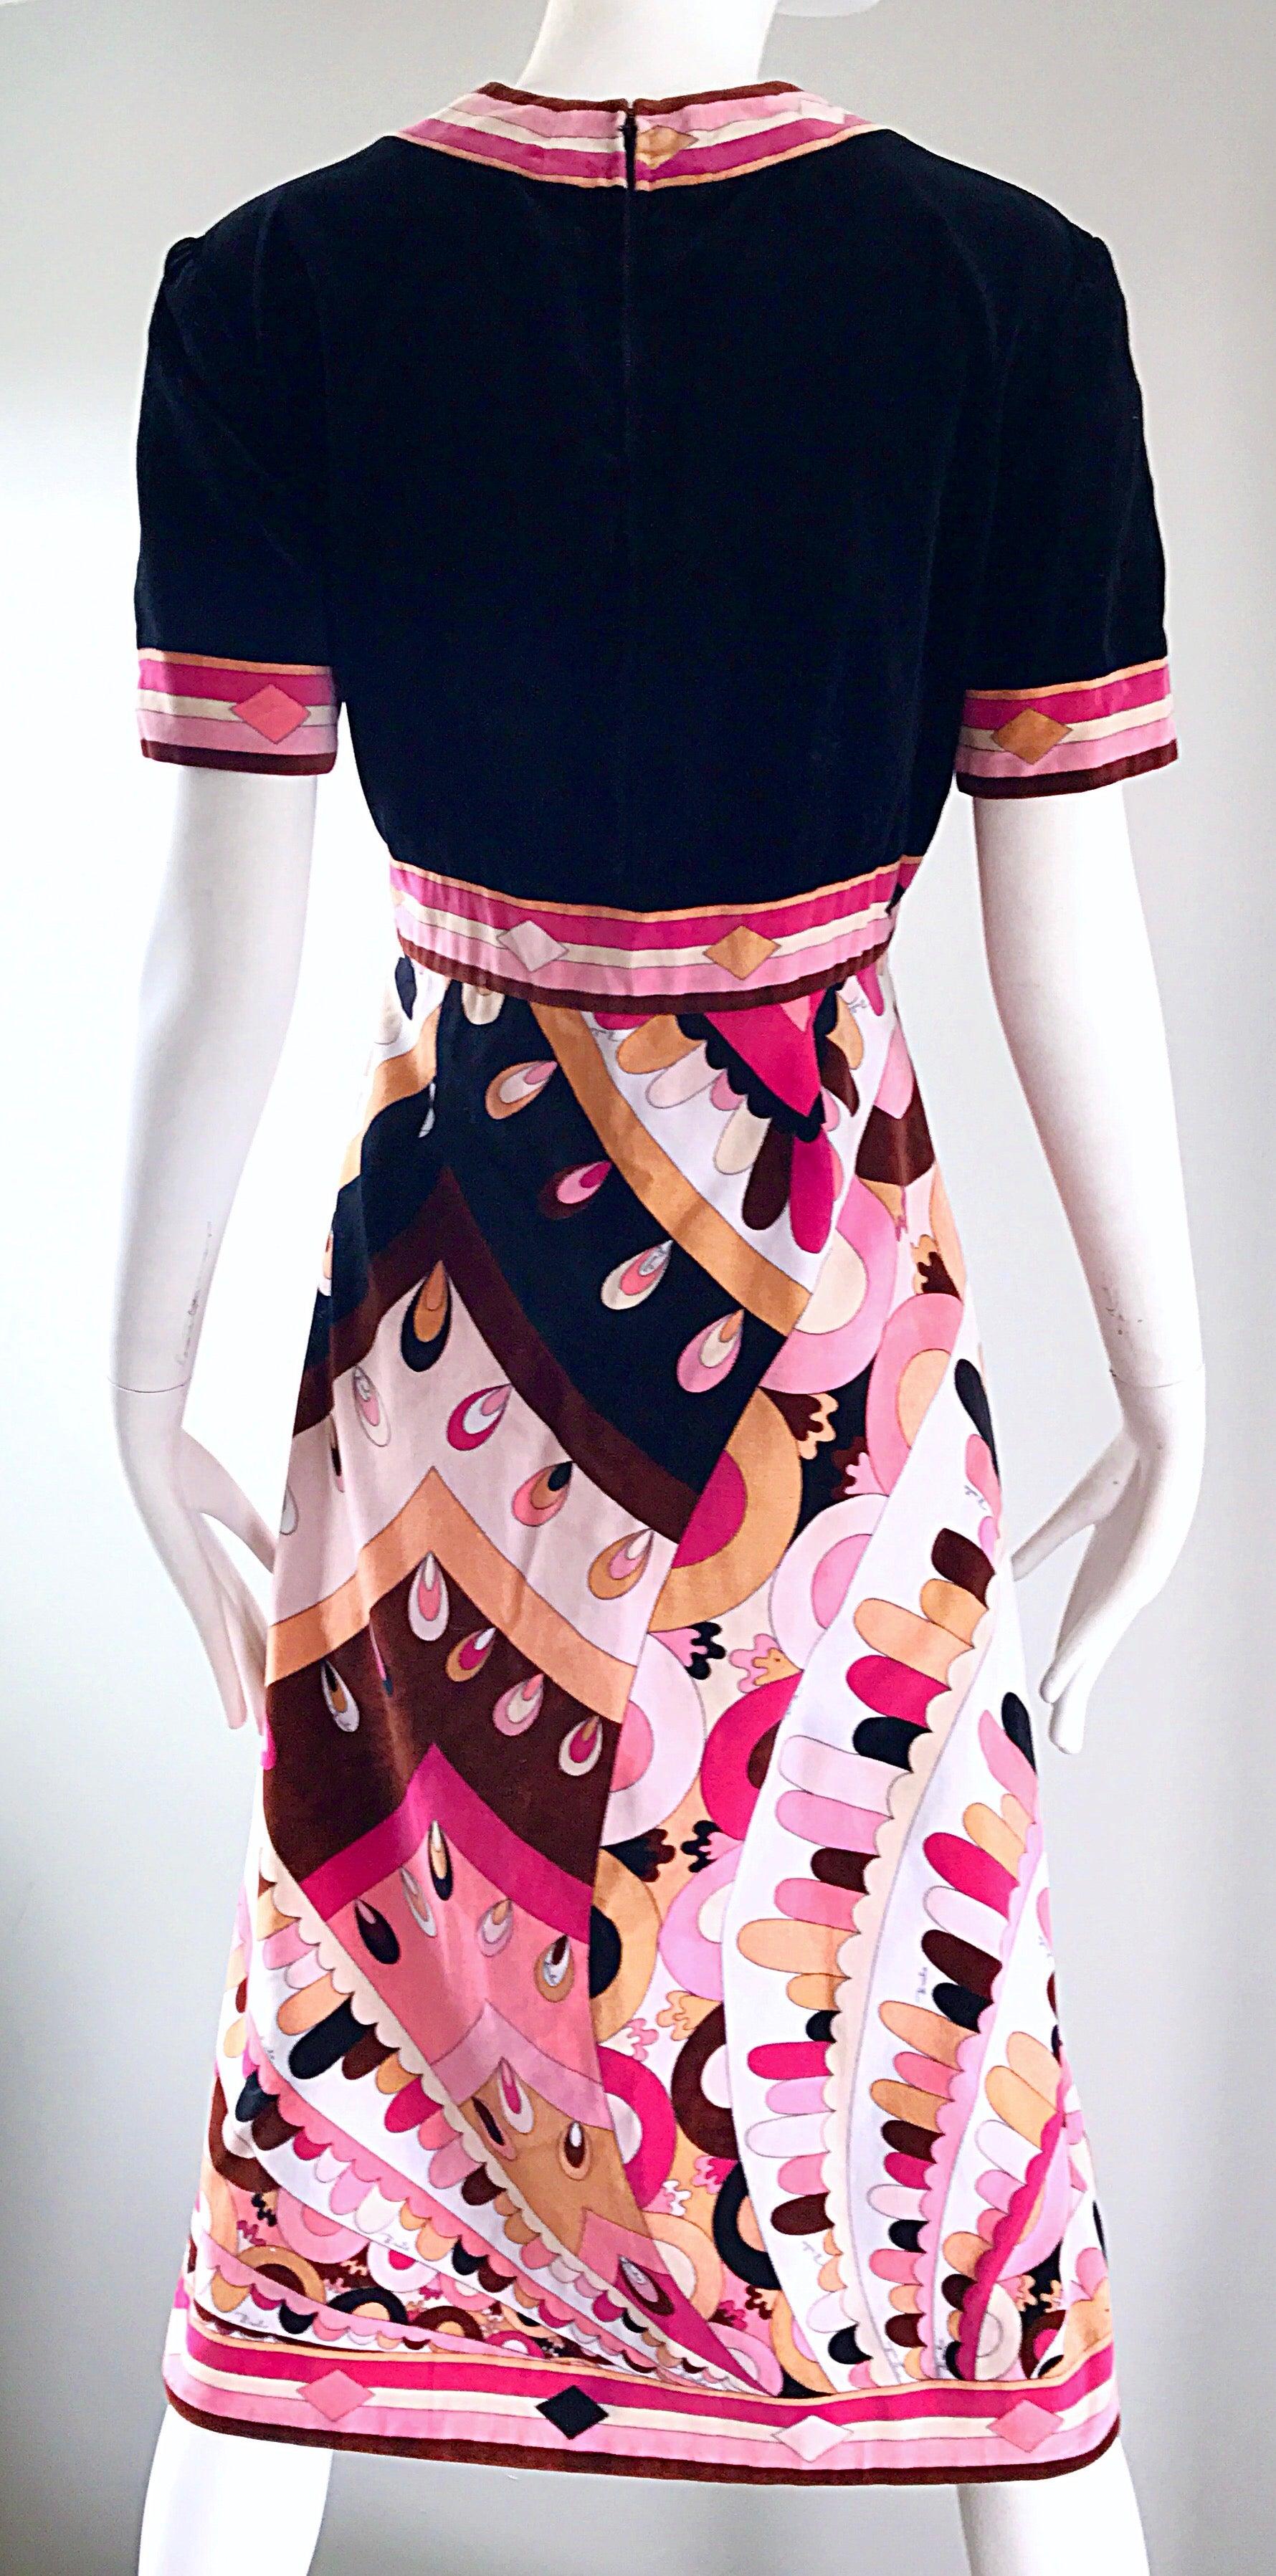 39cd8e529151 Vintage Emilio Pucci 1960s Signature Kaleidoscope Print 60s Velvet A Line  Dress For Sale at 1stdibs